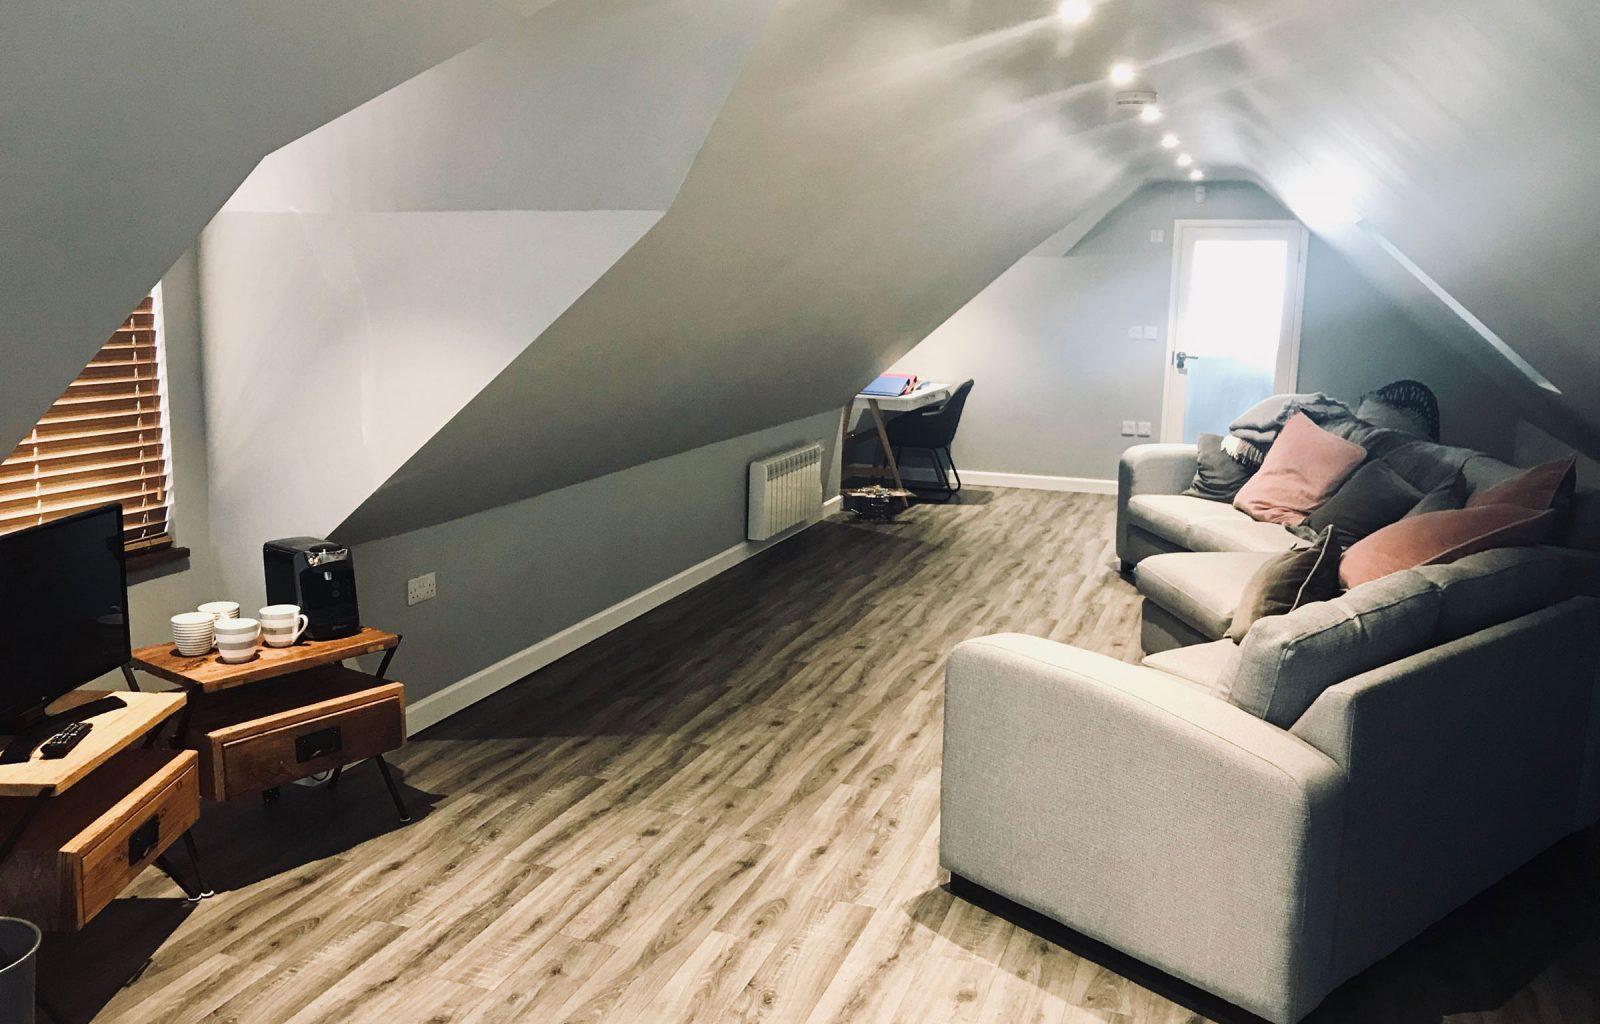 Cartlodge room